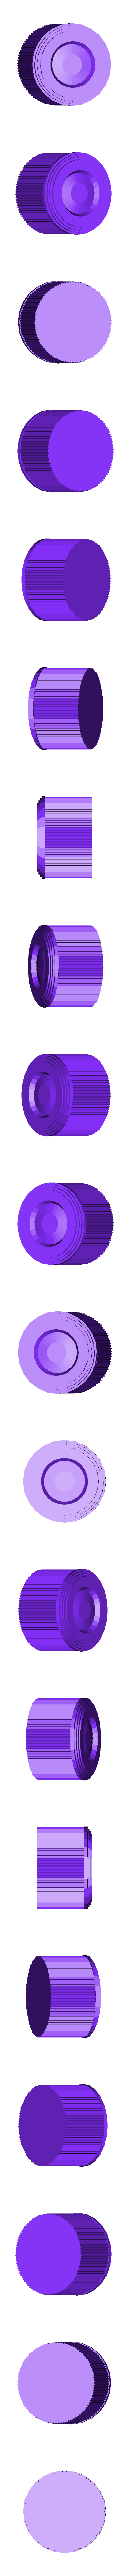 4_lens_fixed.stl Download free STL file Canon EOS 350D model • 3D printer template, Aralala